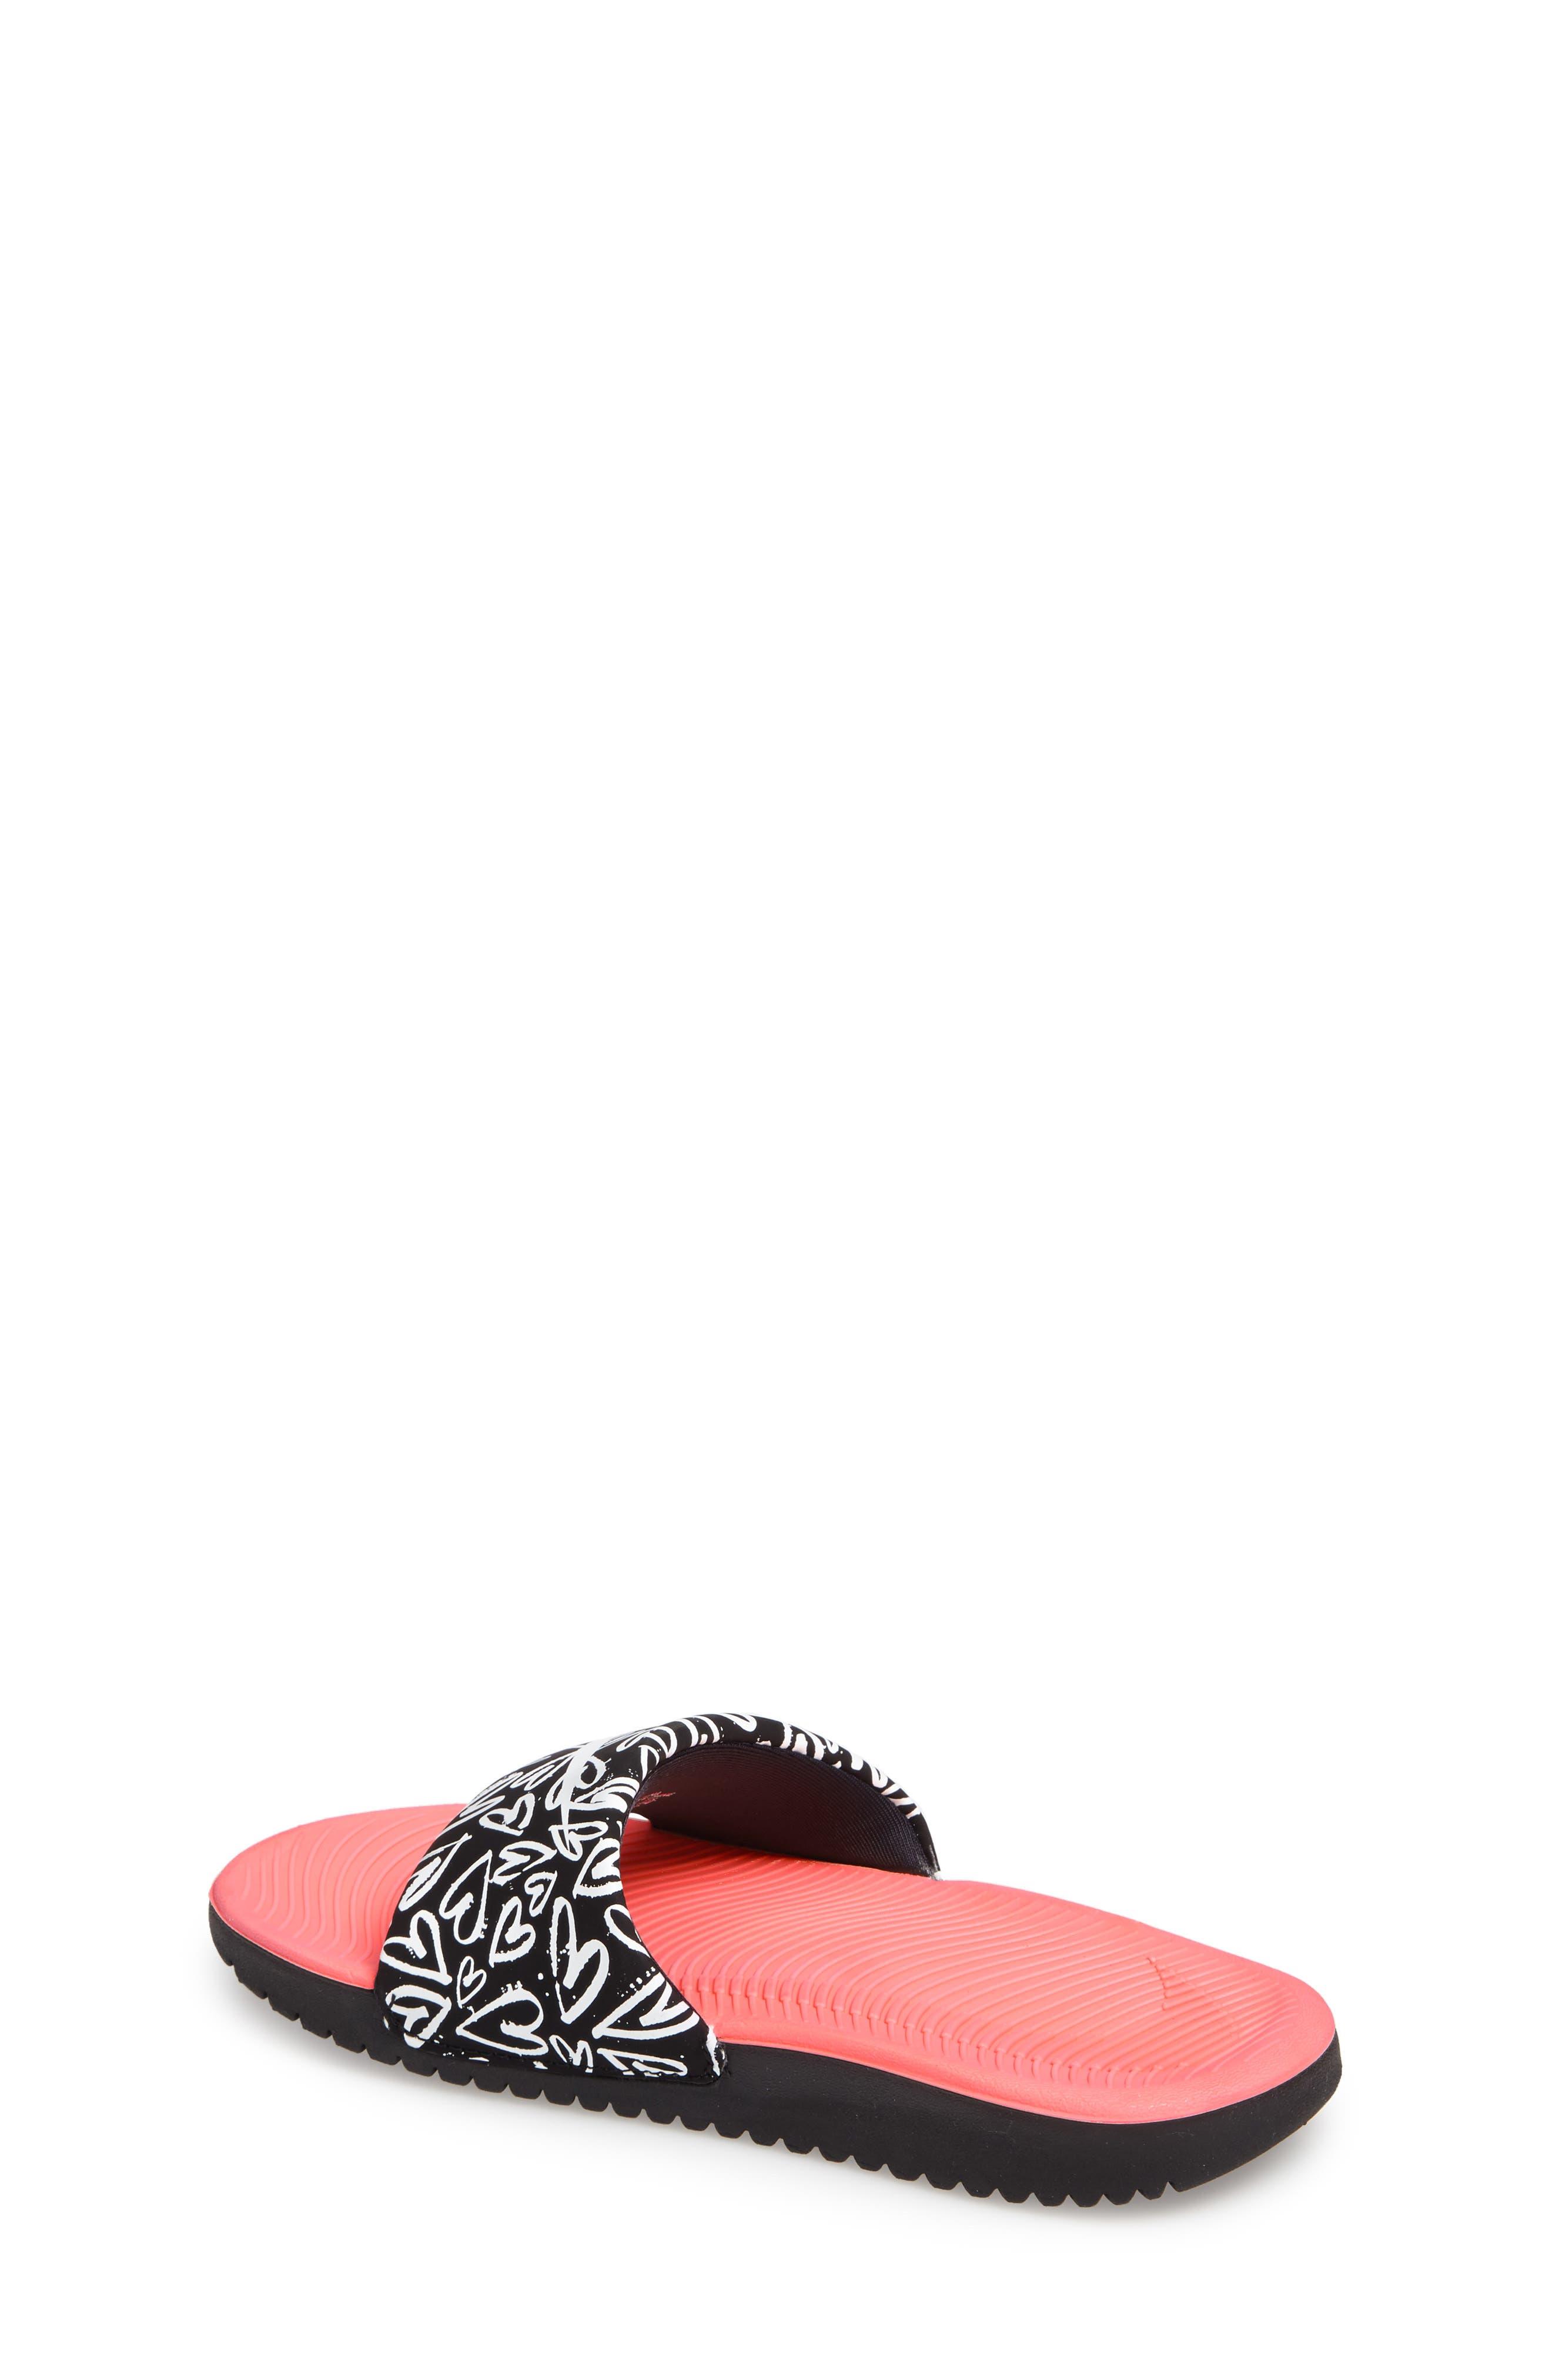 'Kawa' Print Slide Sandal,                             Alternate thumbnail 9, color,